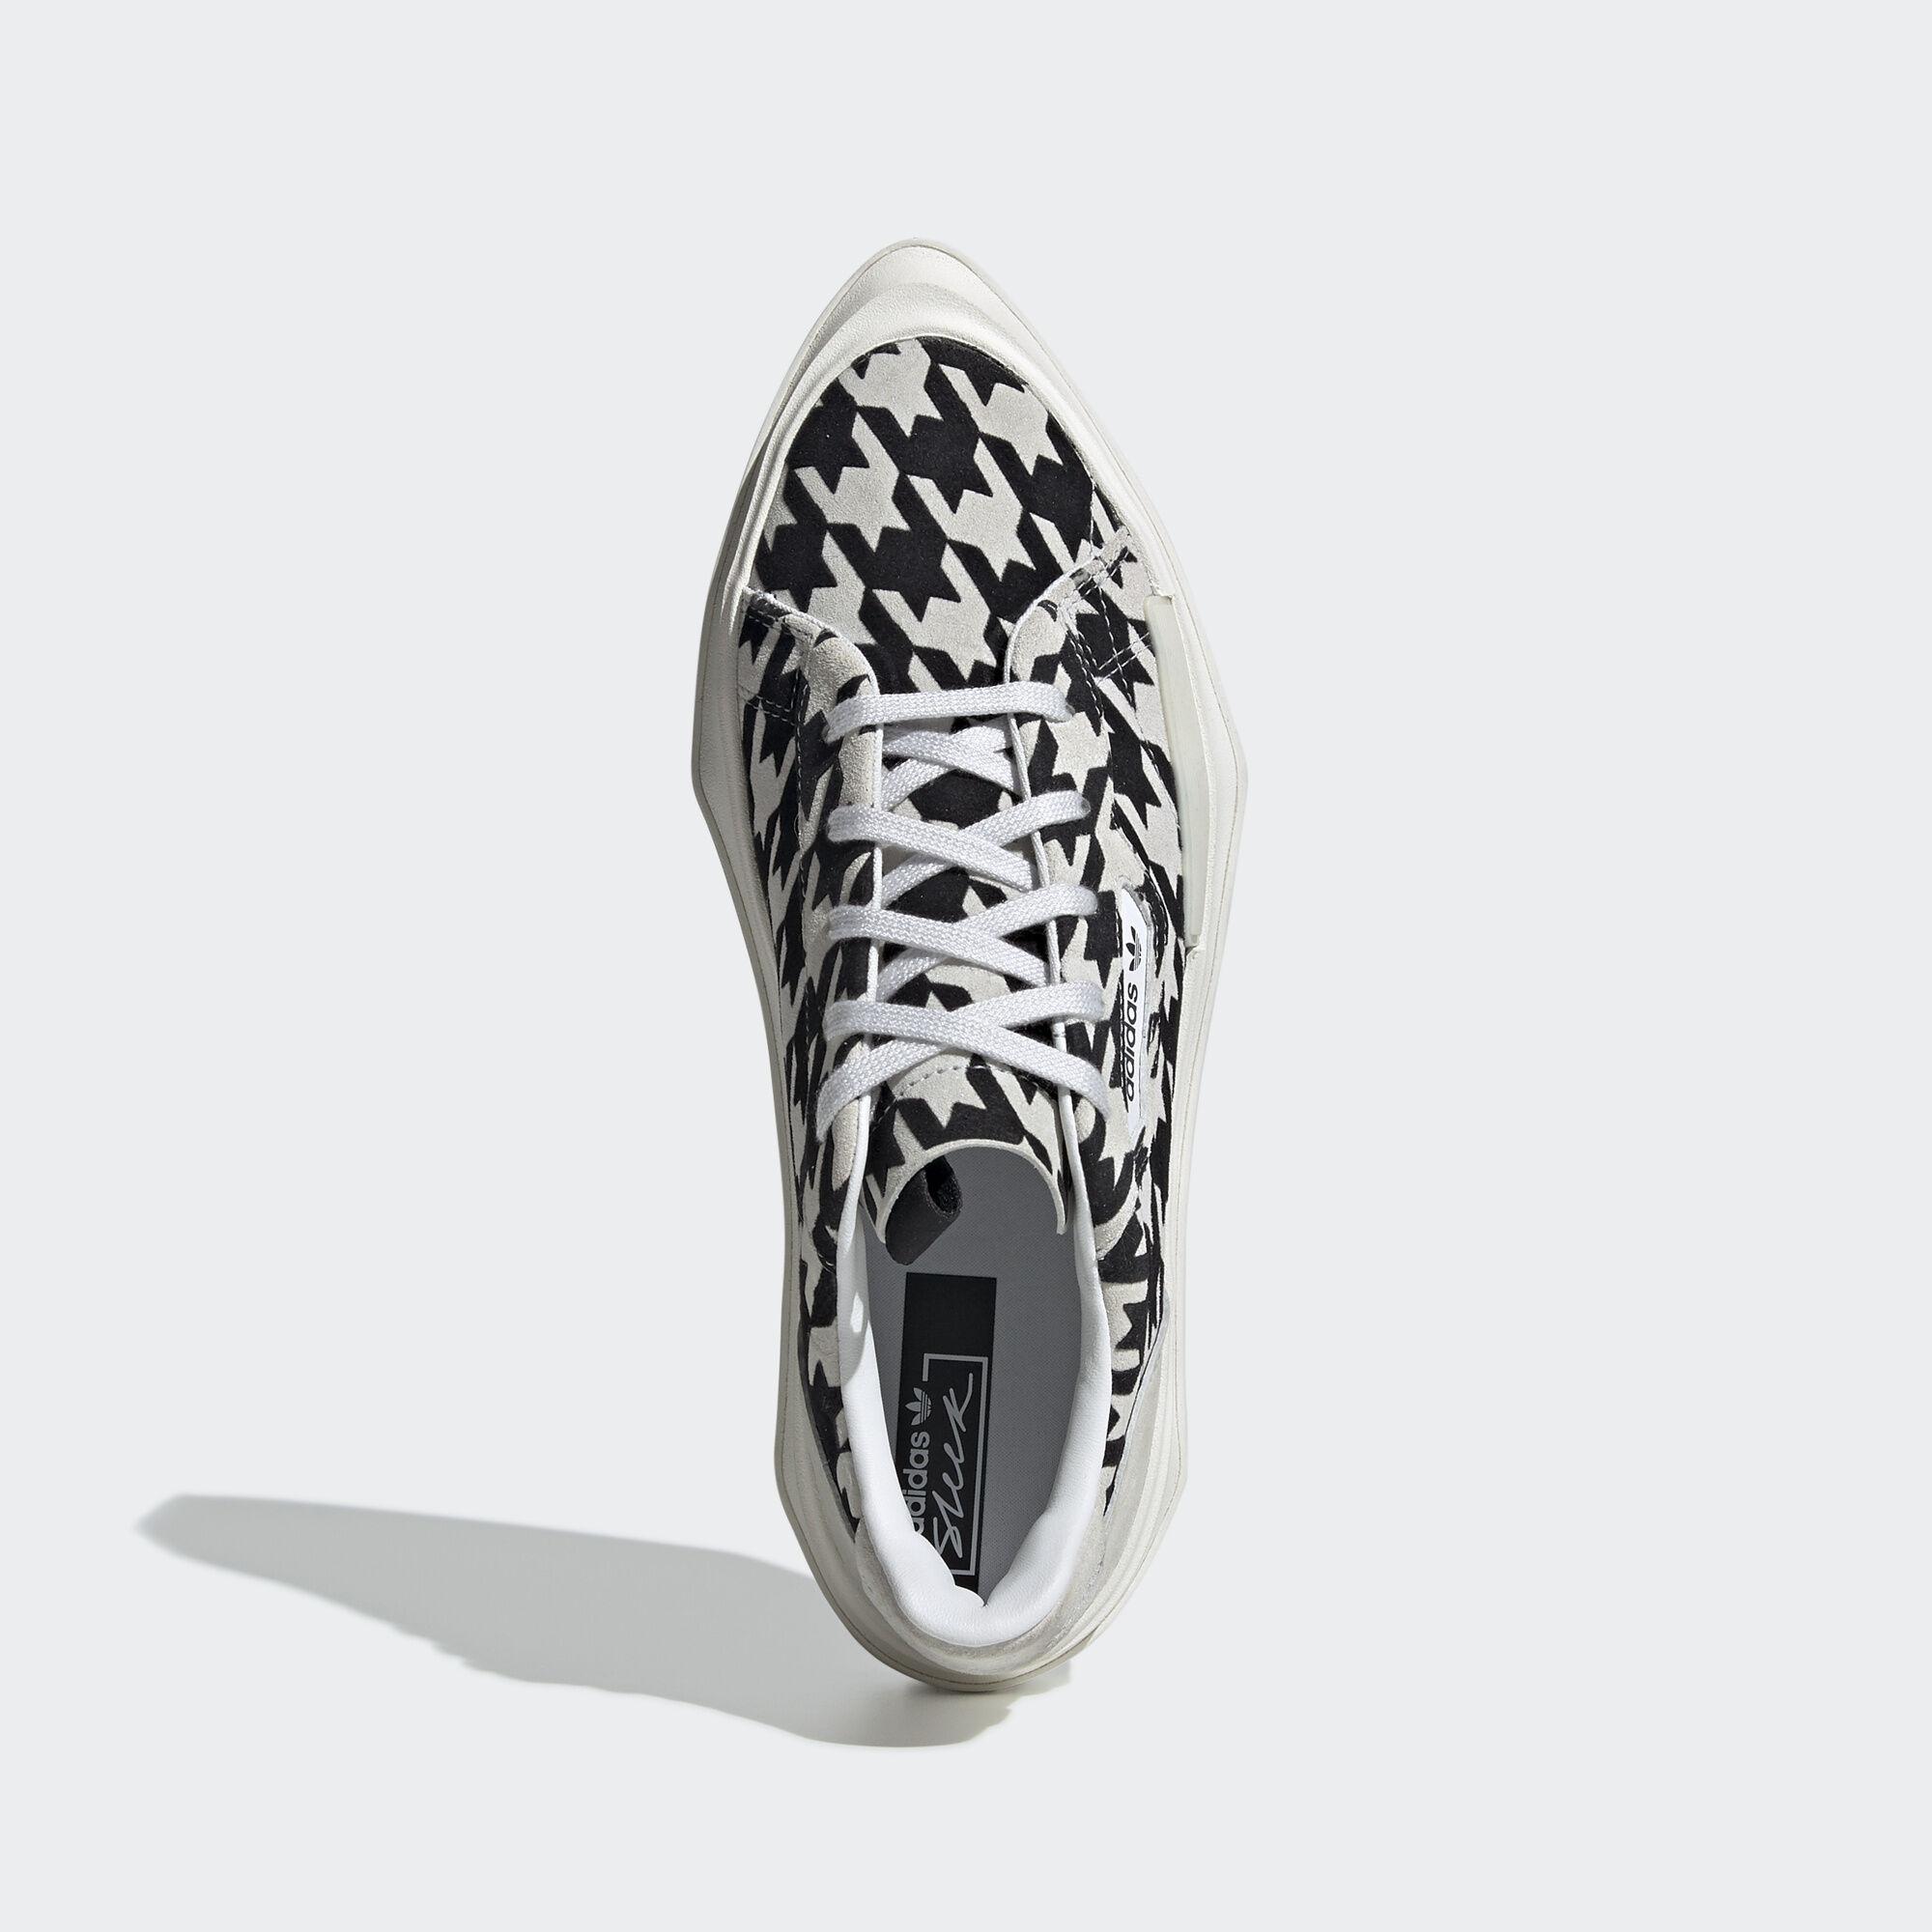 Adidas adidas Hypersleek Crystal White G54058